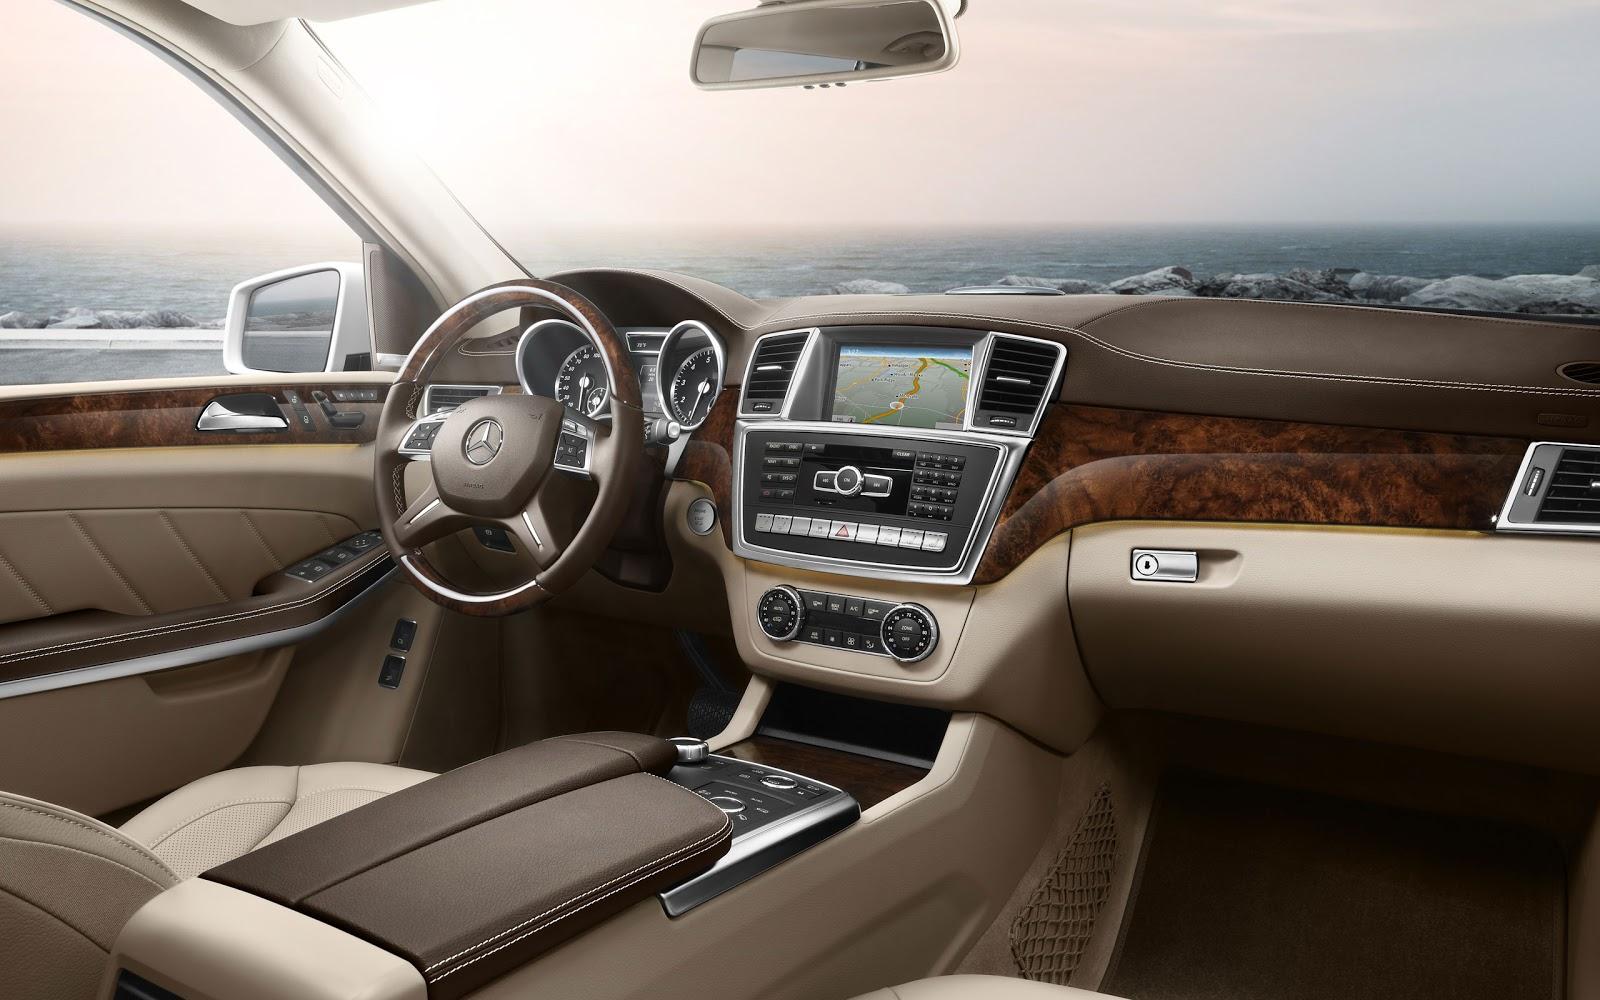 http://3.bp.blogspot.com/-Oi6ItlYFIqo/UJ72bg_LYyI/AAAAAAAAH3E/mUCBU7z4ShY/s1600/GL-Class-SUV-2013-Mercedes+Benz--interior-cockpit-steering-dashboard-biege-leather-interior.jpg